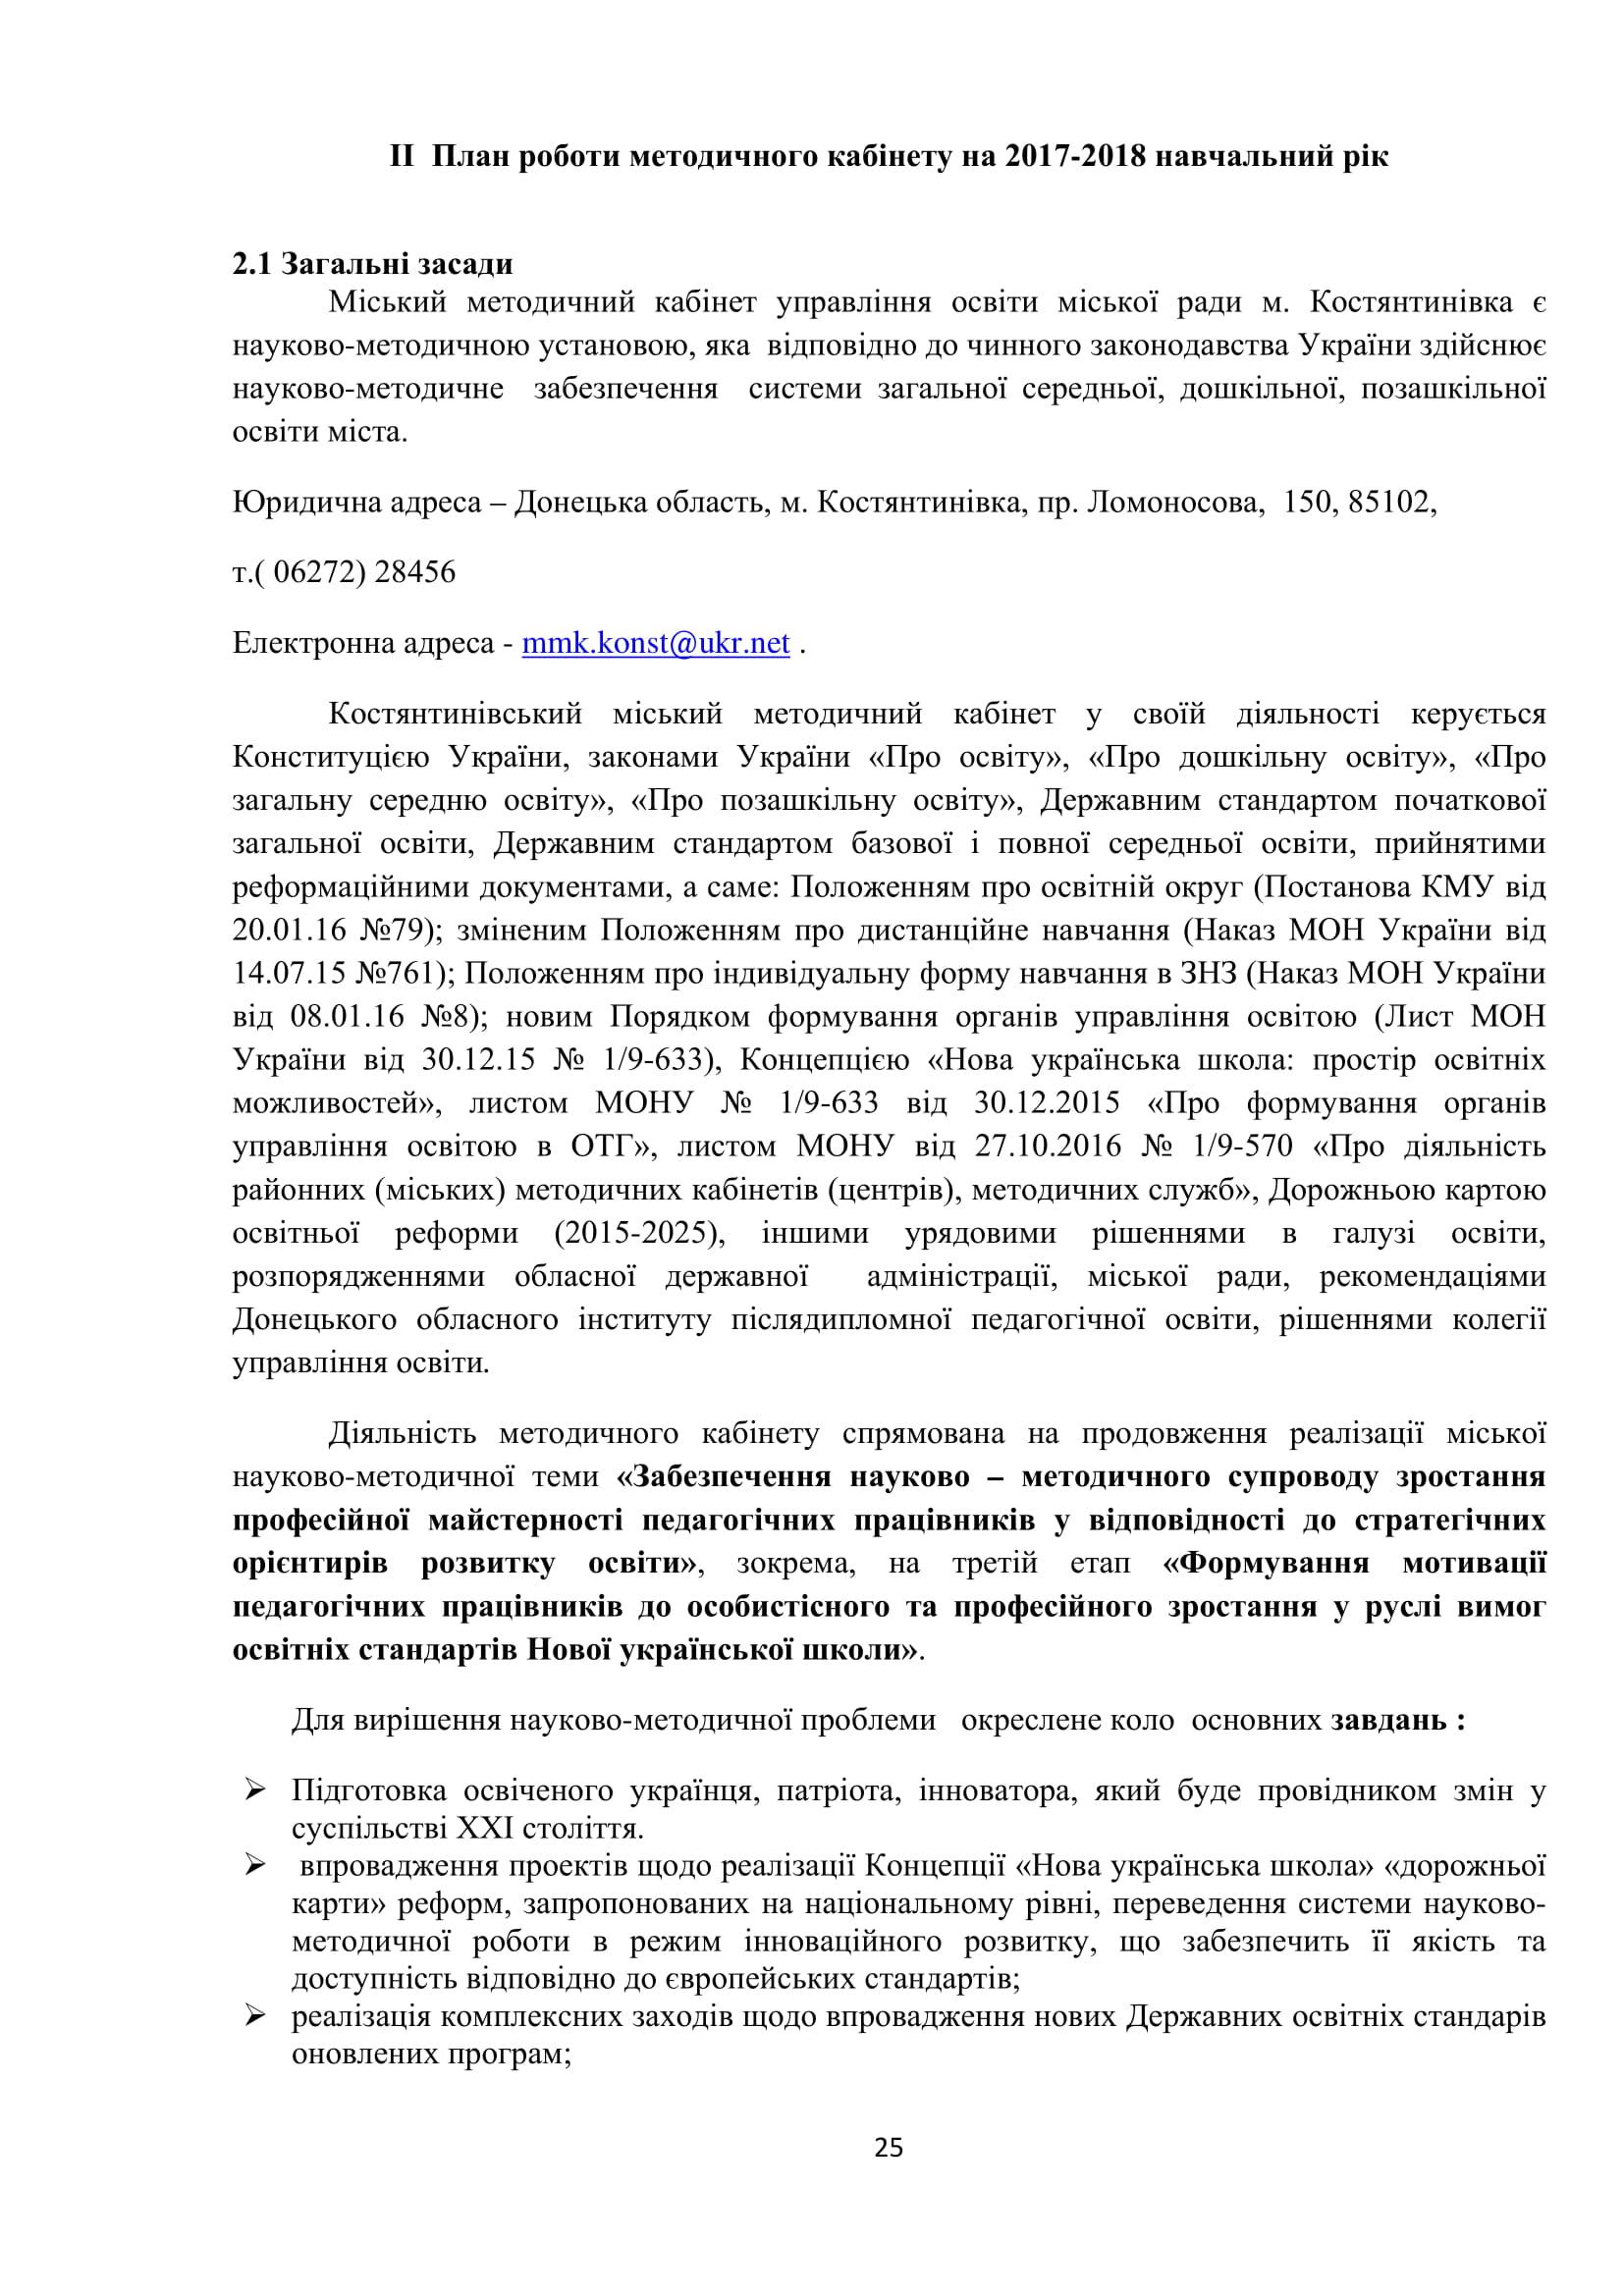 2017-2018 - ММК план роботи-26